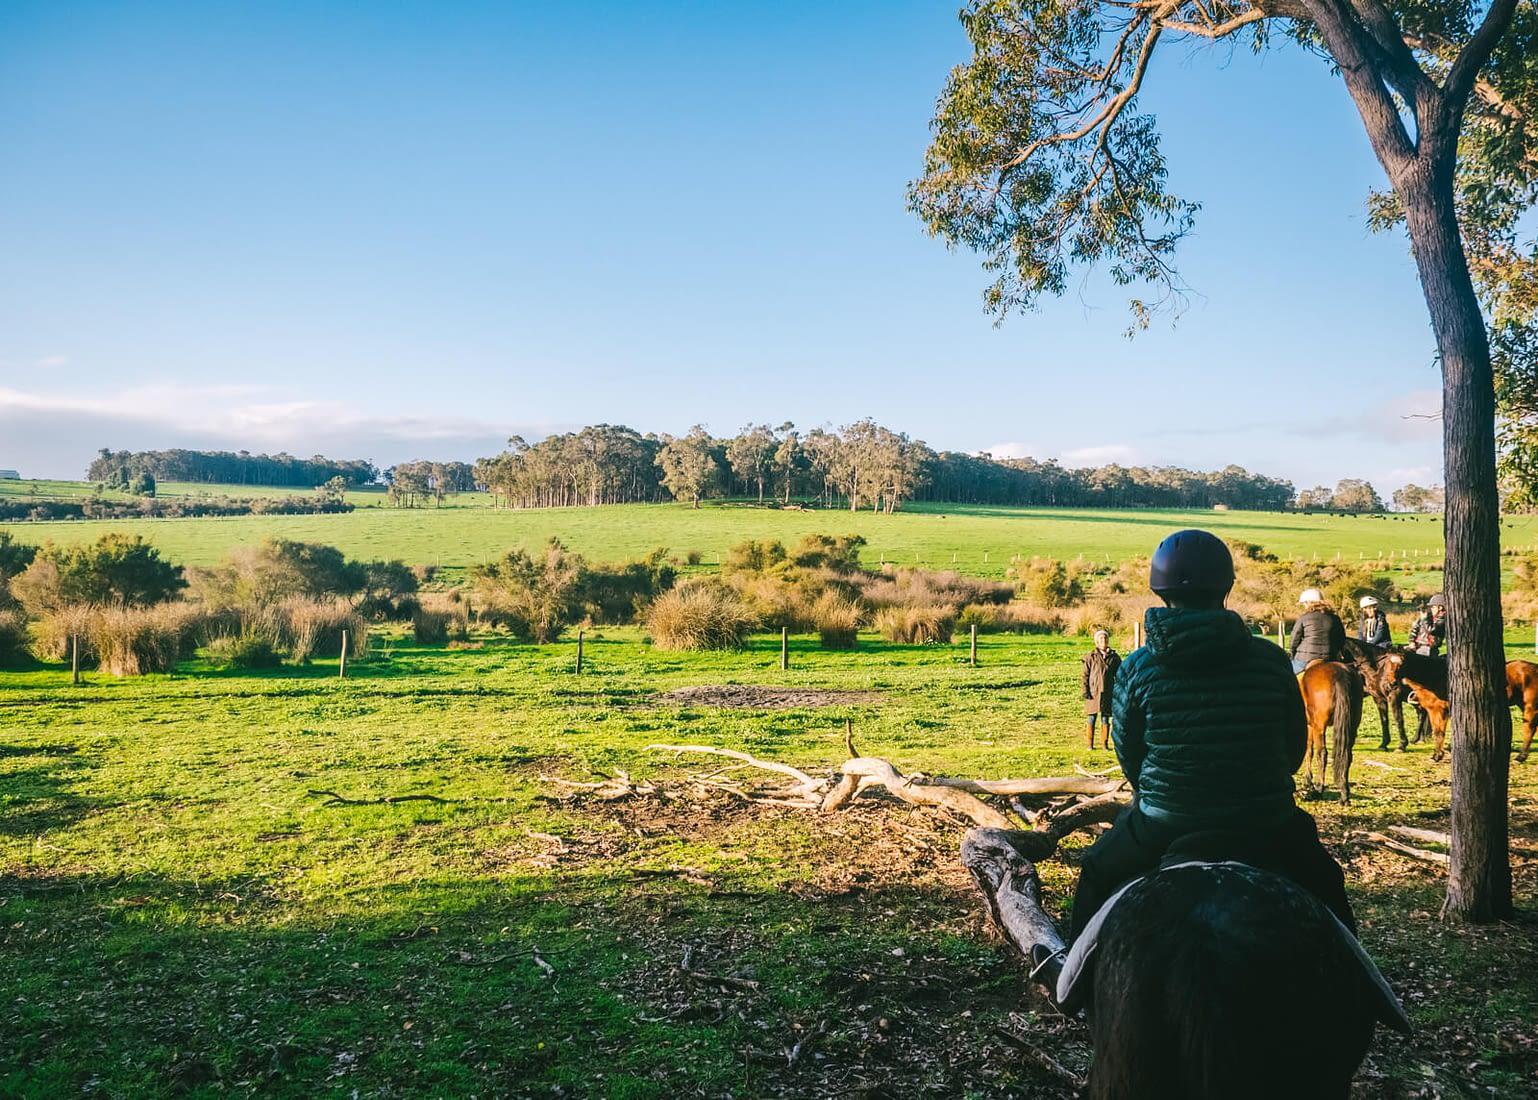 Perth, Australia - Jesters Flat - Arrive at rest area